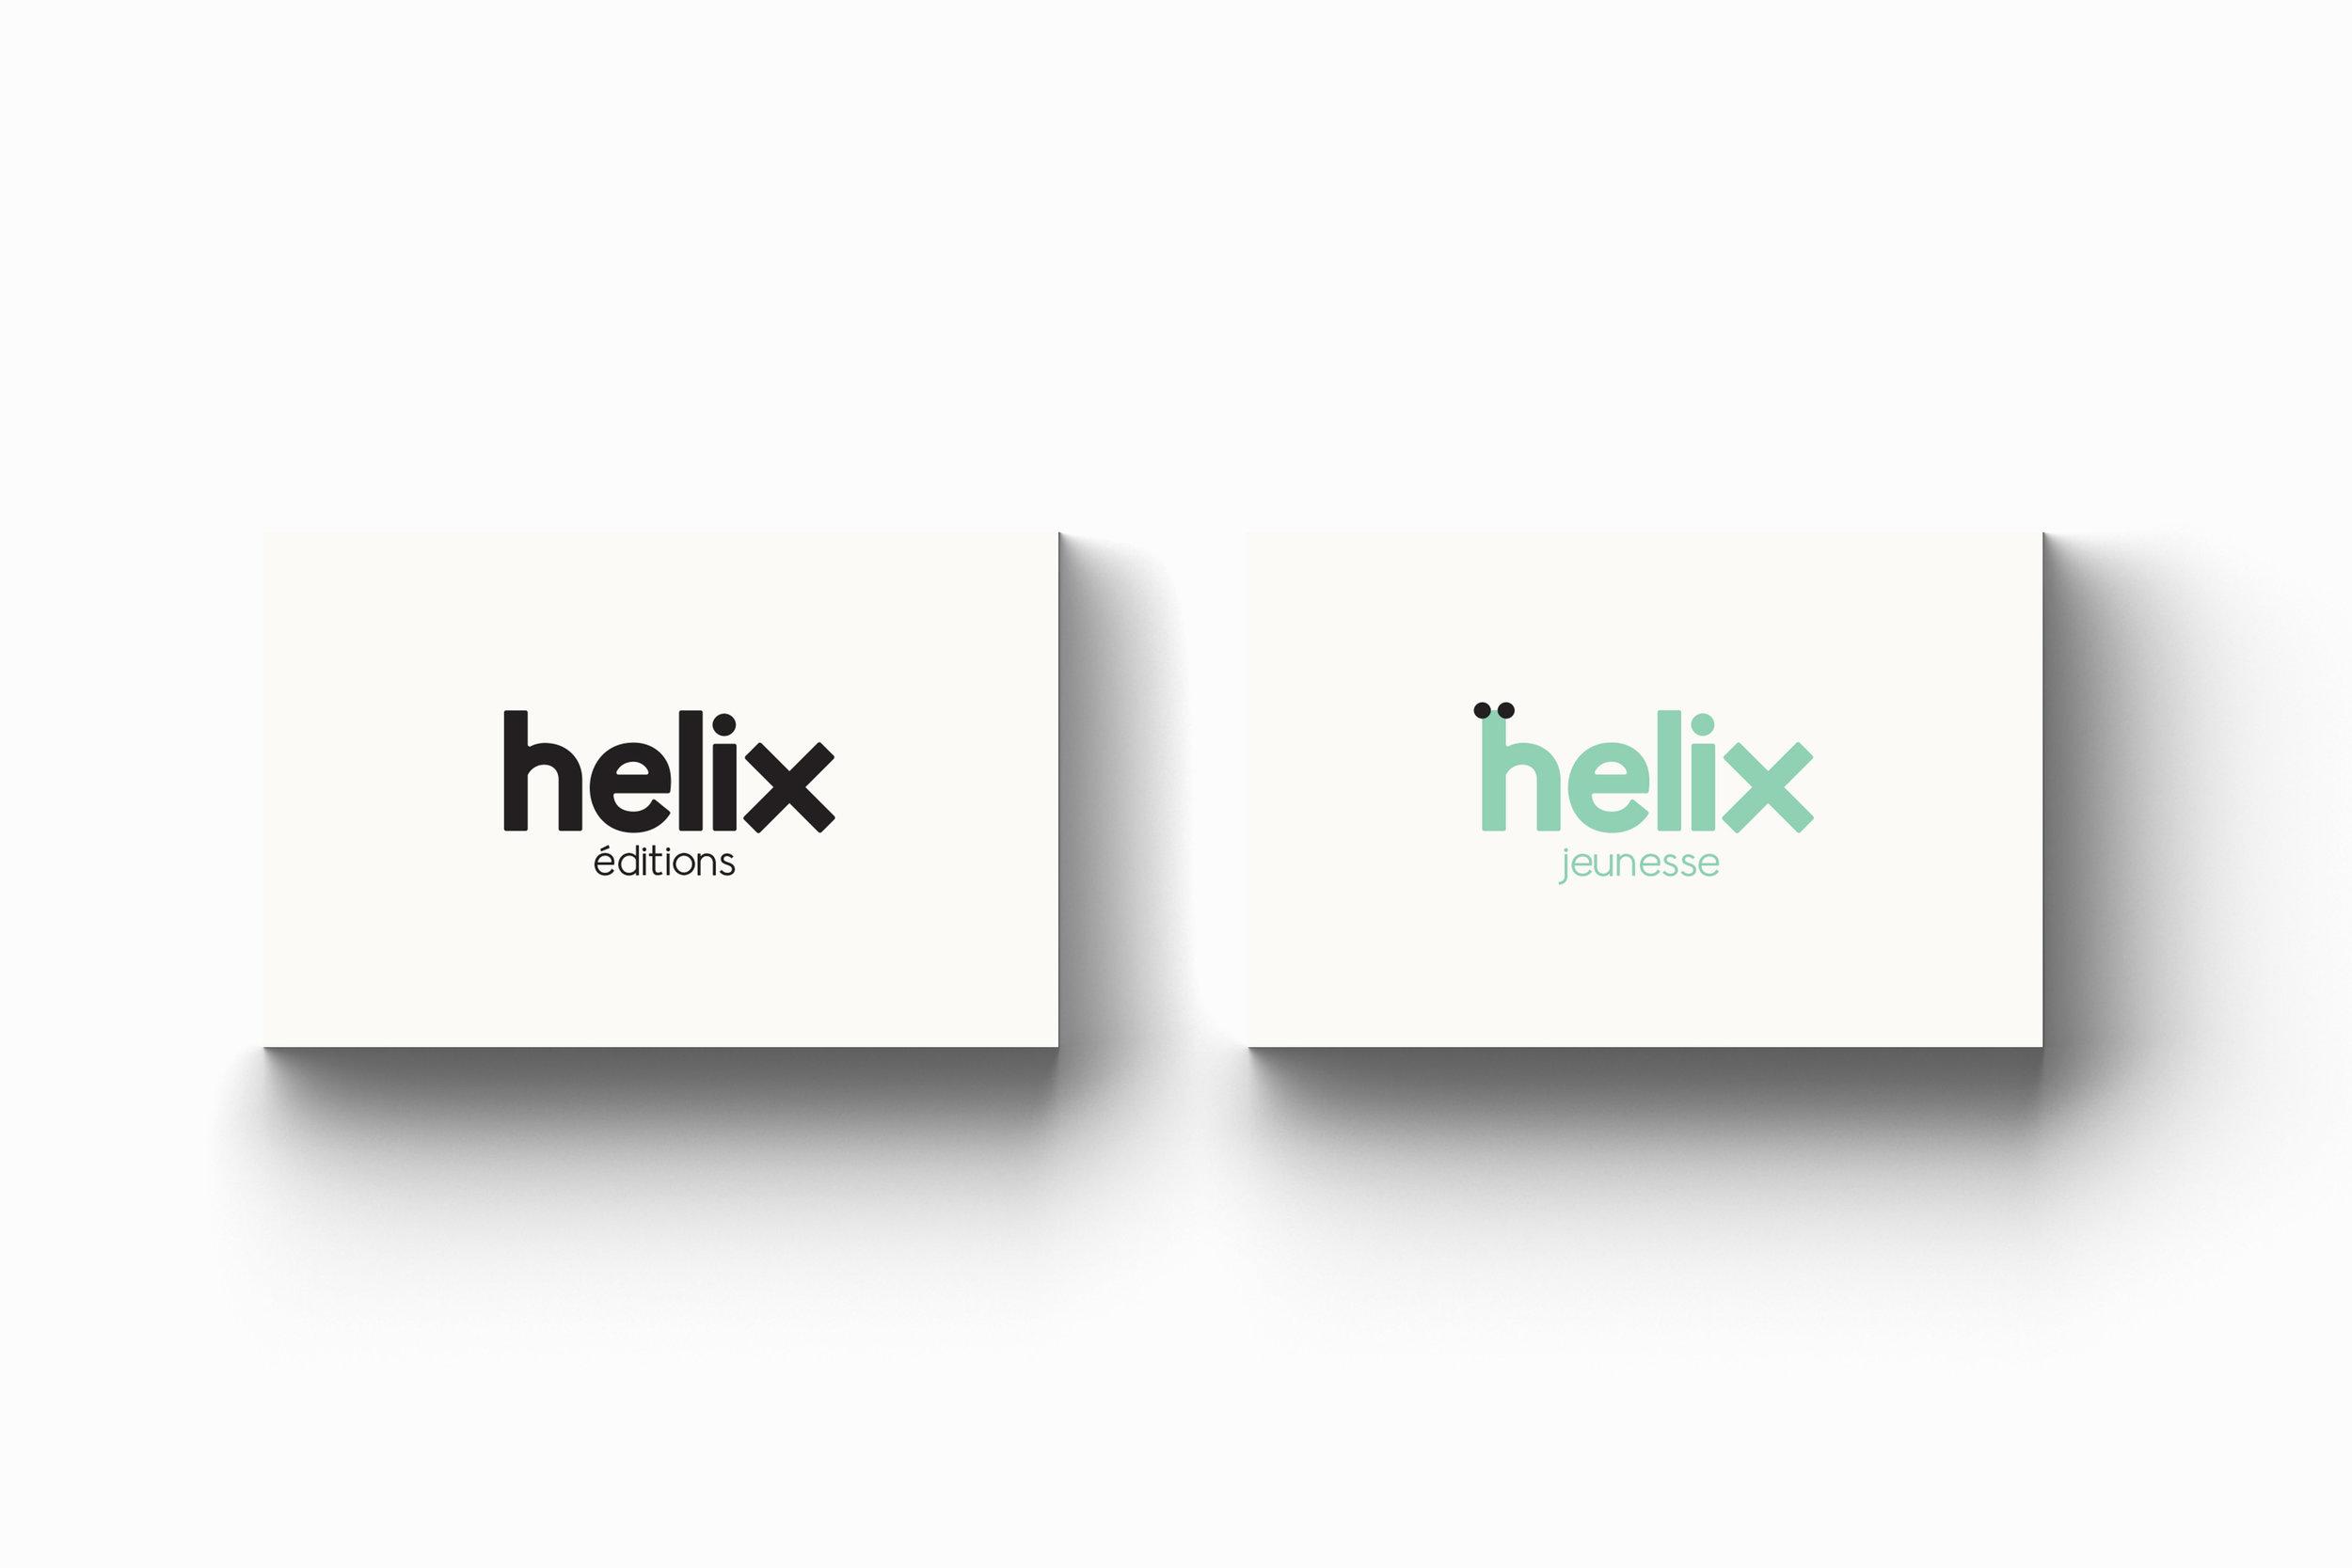 helix éditions — Logo